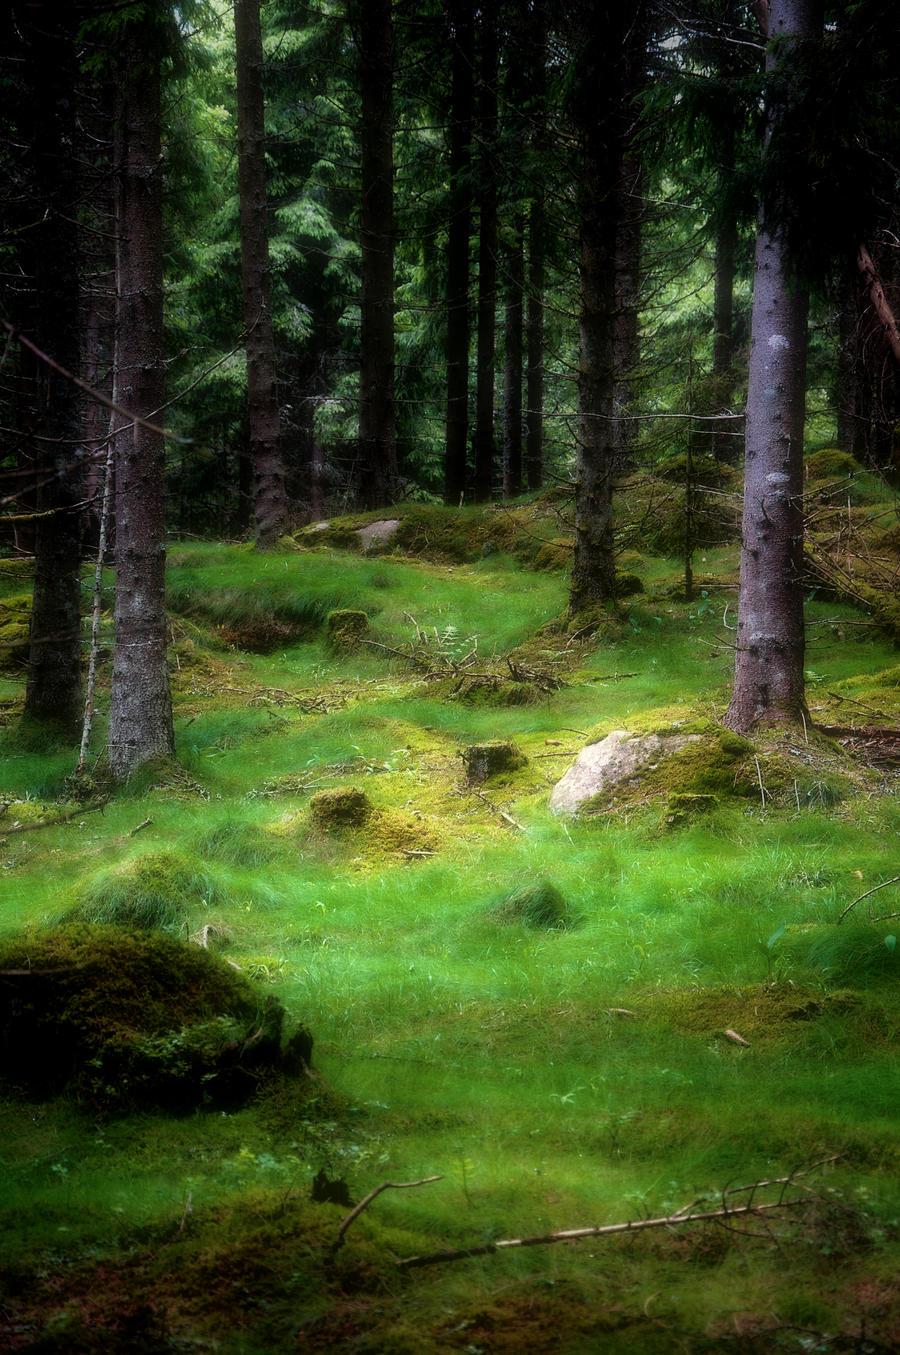 When it's green by RavensLane